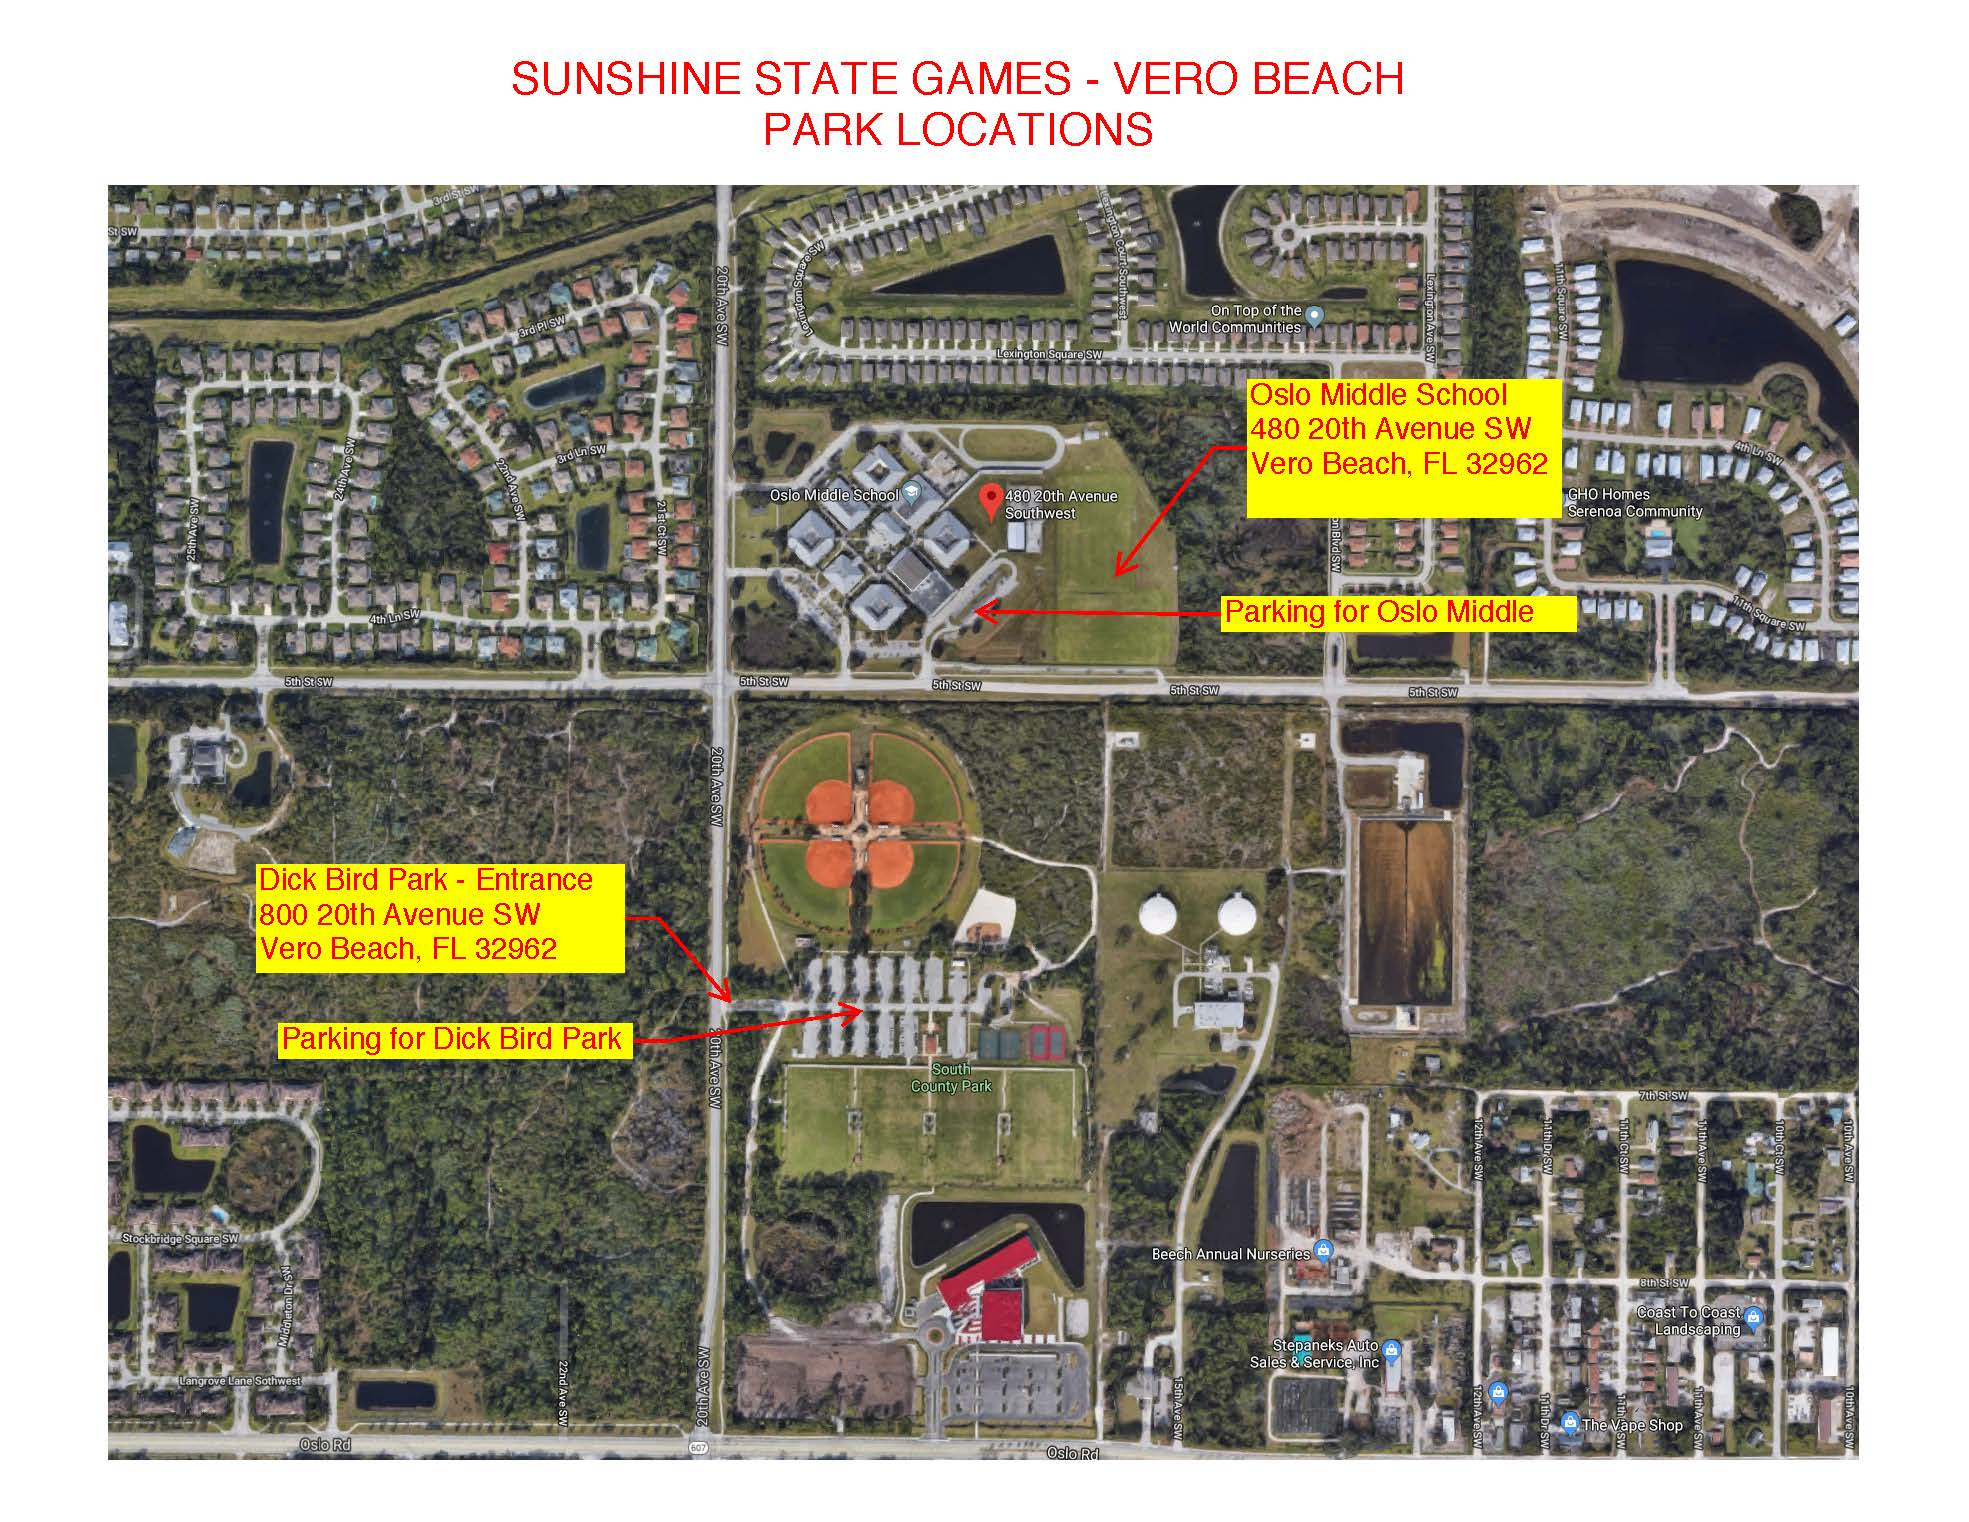 SSG Vero - Park Locations